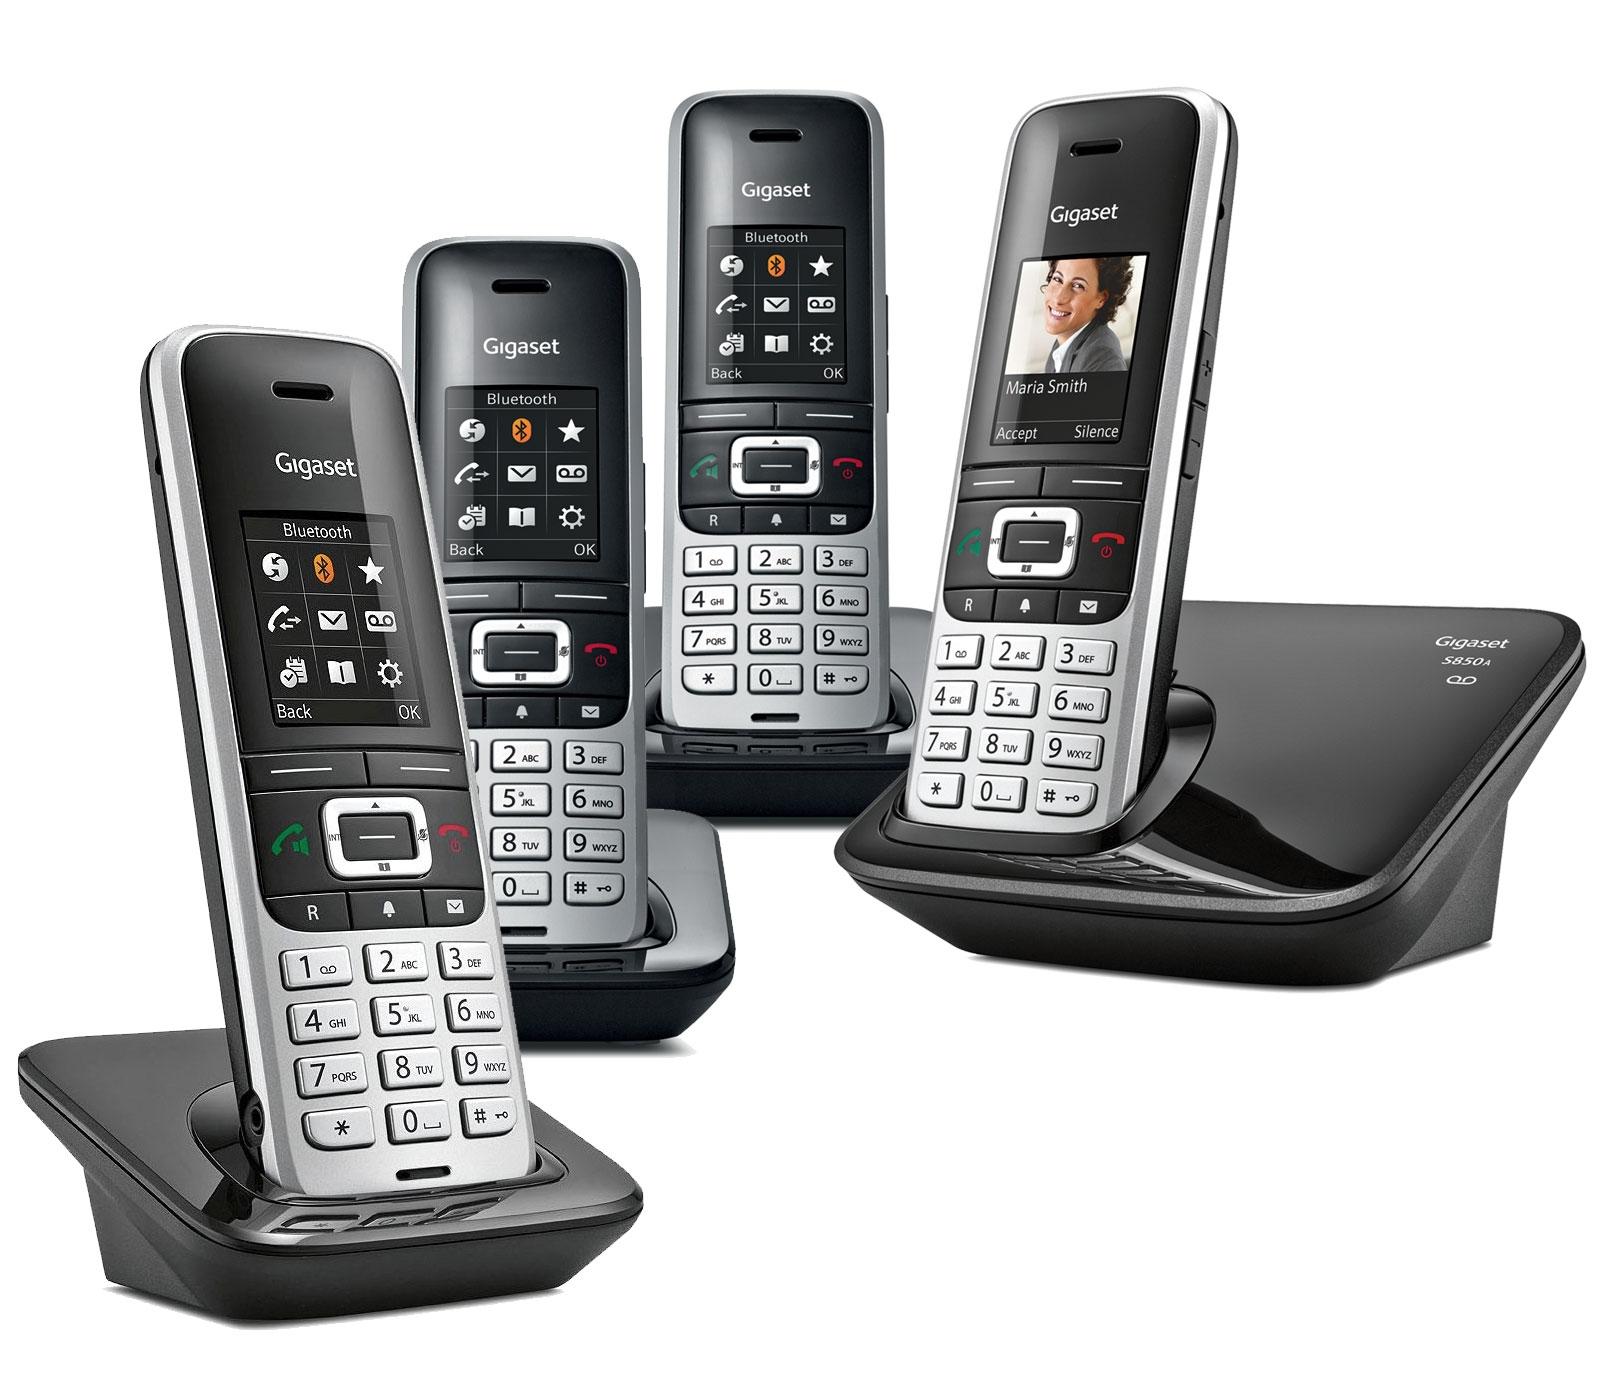 Image of Siemens Gigaset Premium S850A Cordless Phone, Quad Handset with Answer Machine